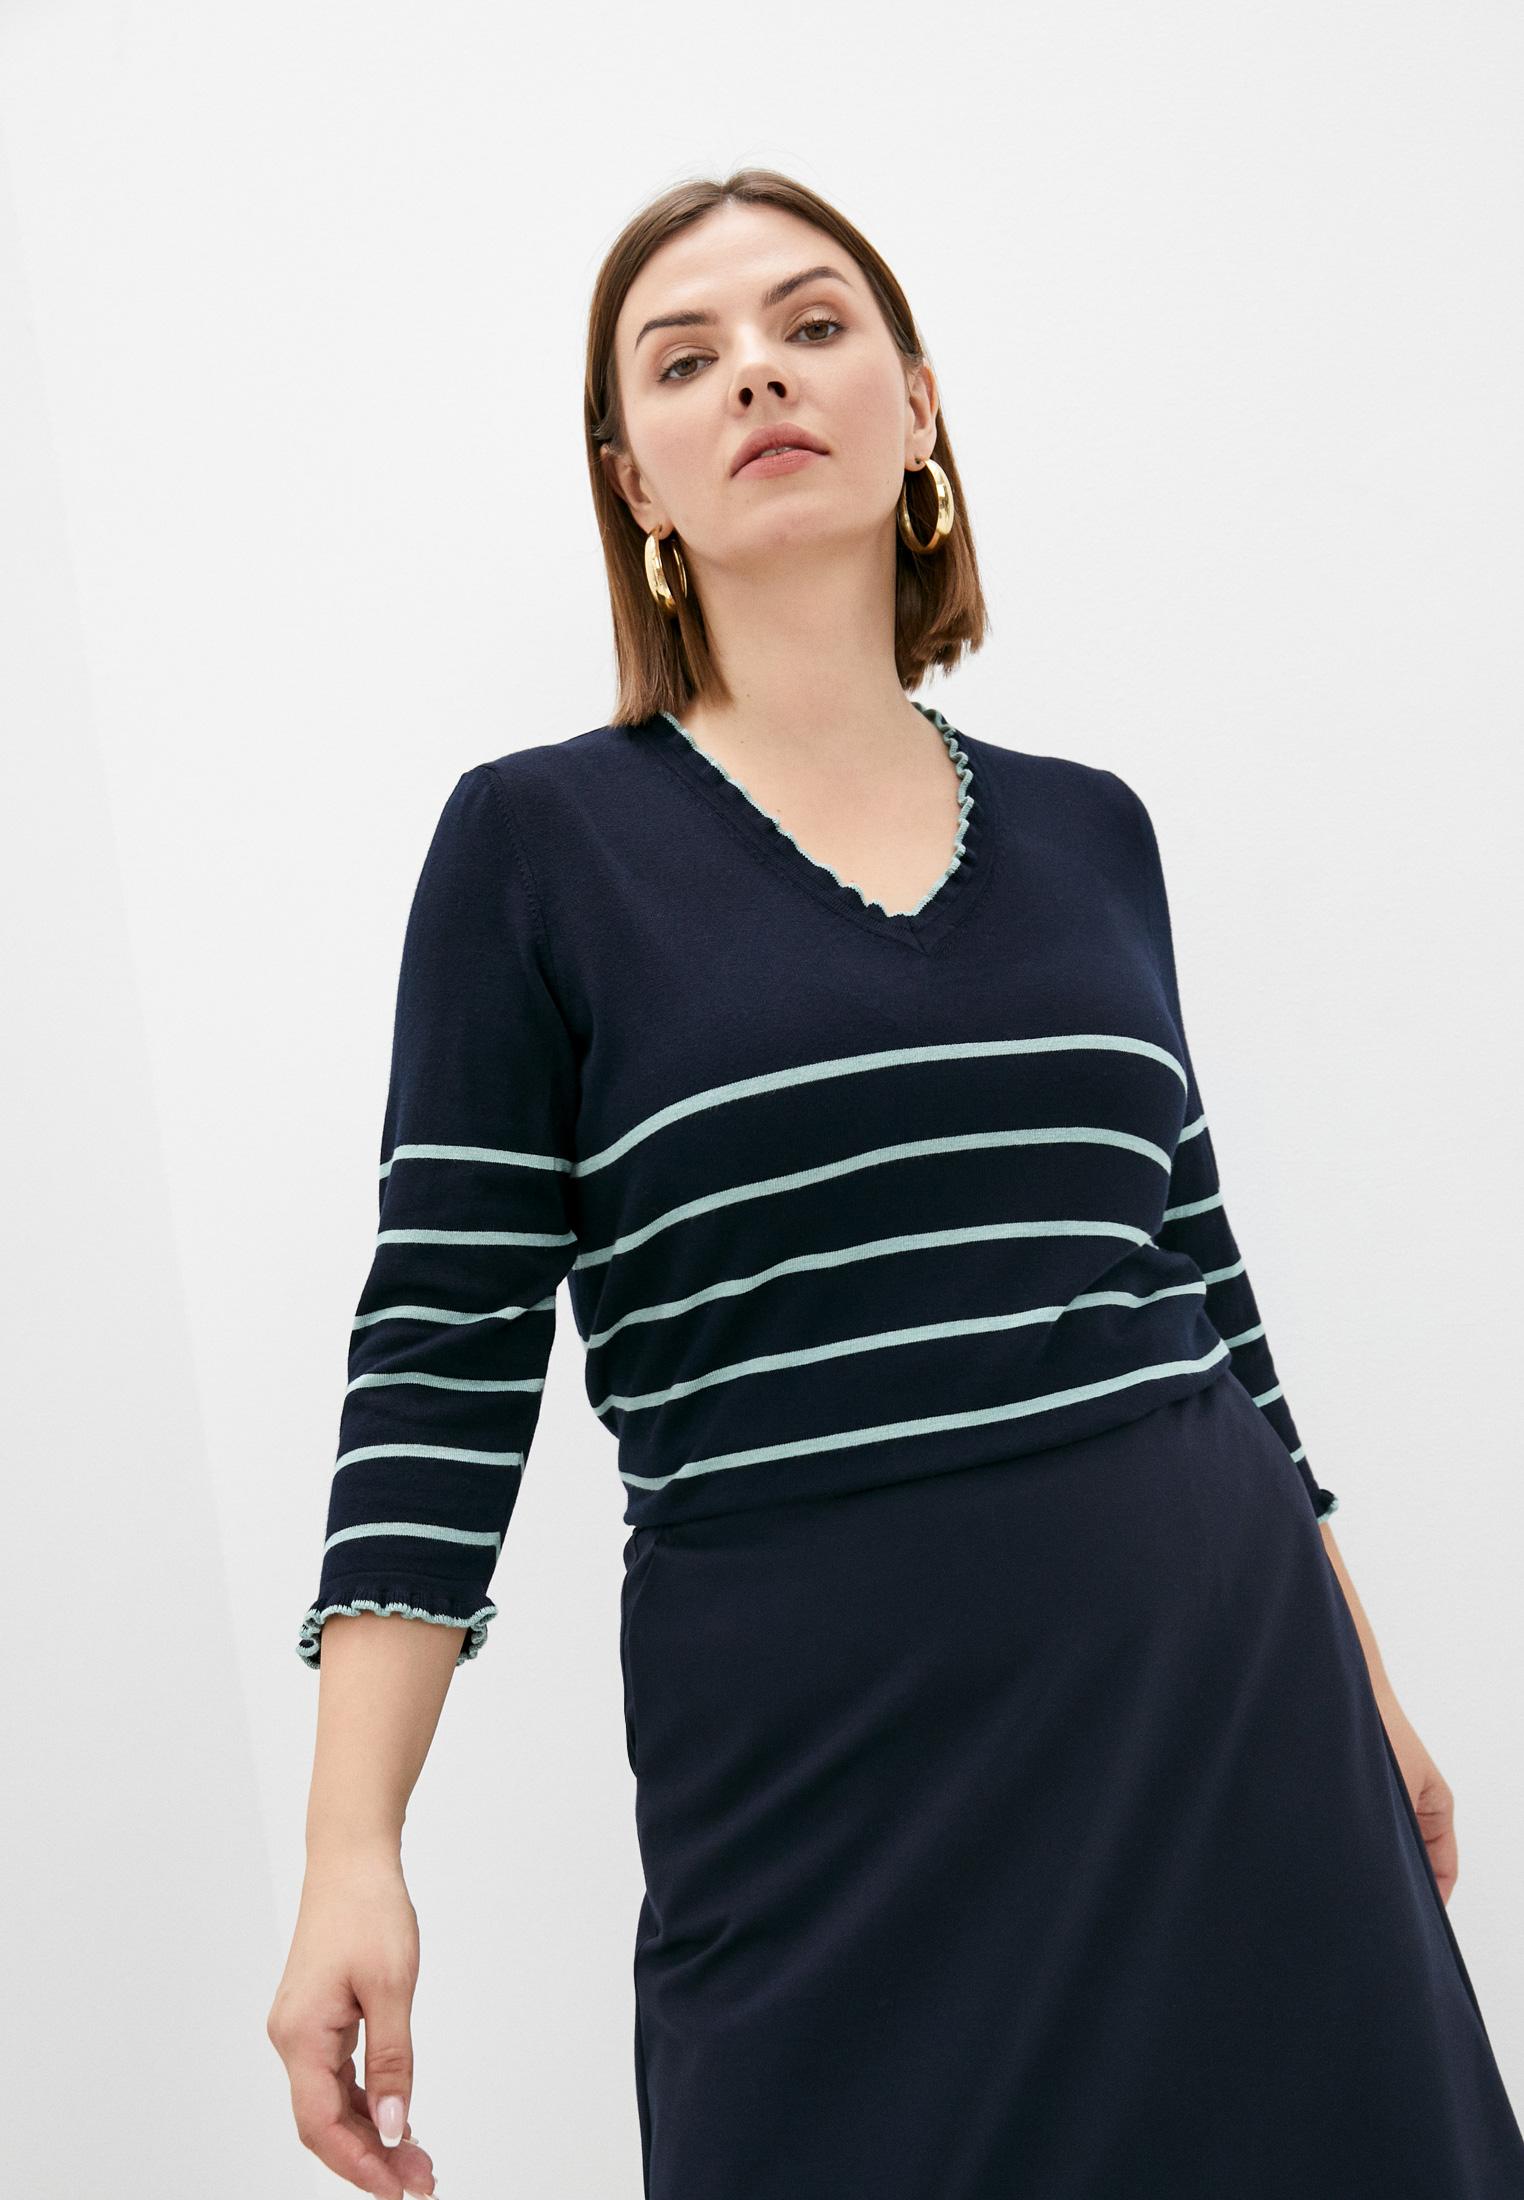 Пуловер Persona by Marina Rinaldi Пуловер Persona by Marina Rinaldi